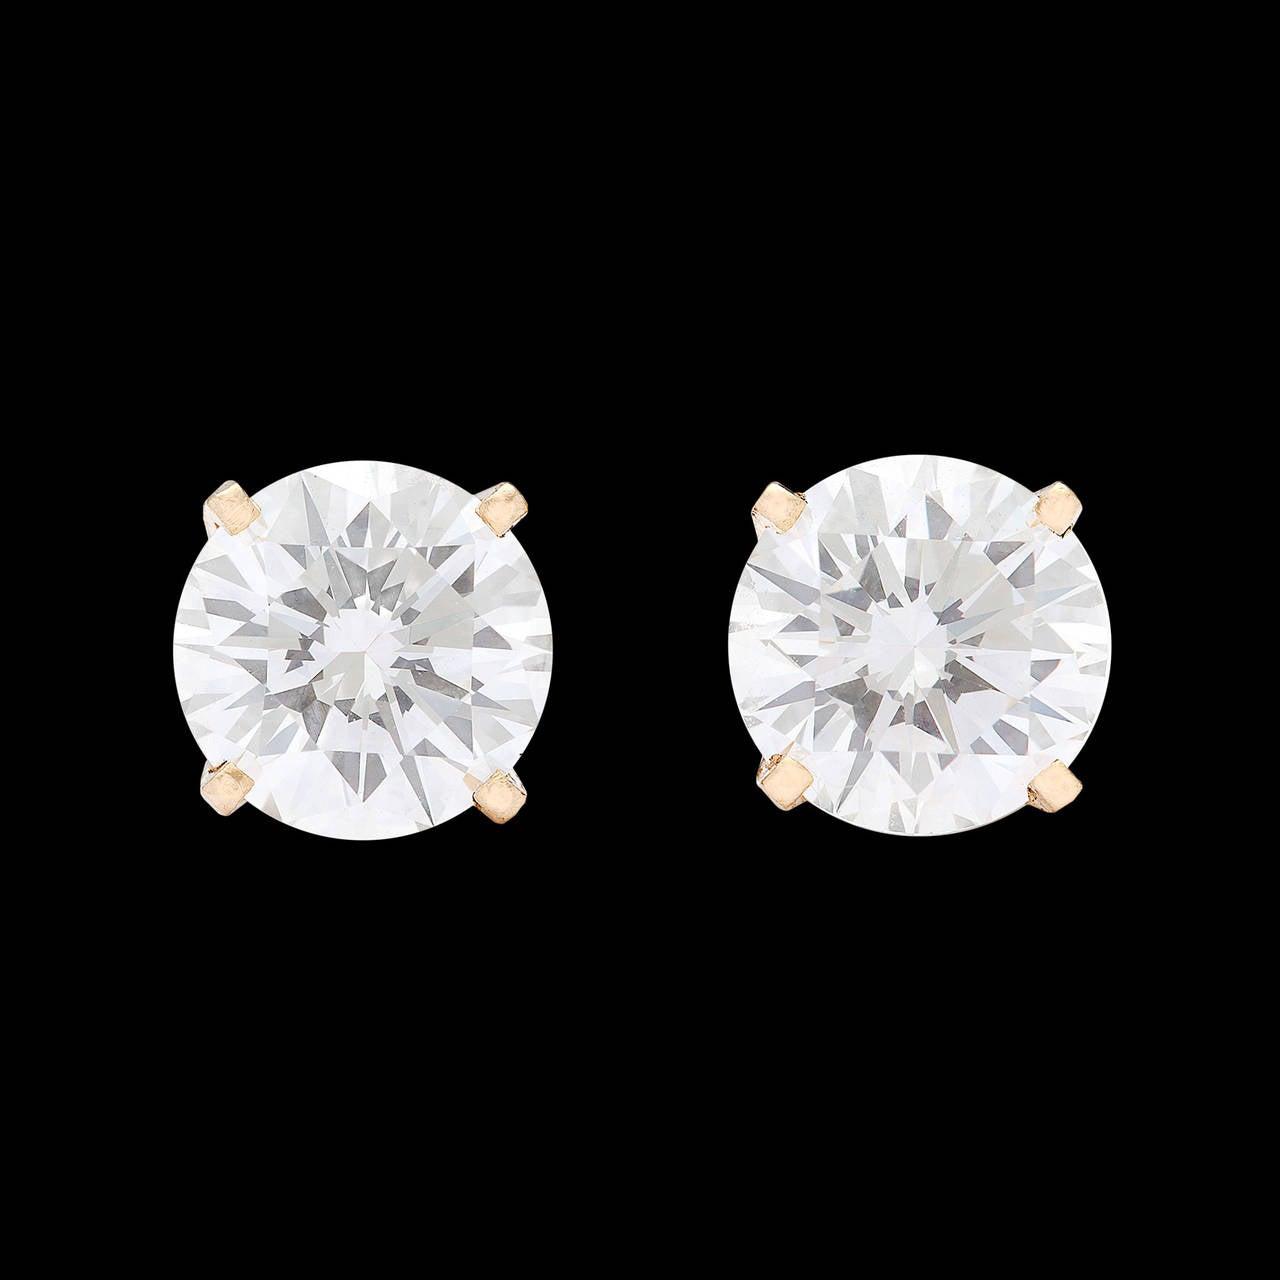 2.04 Carat GIA Cert Round Brilliant Cut Diamond Gold Earrings 2